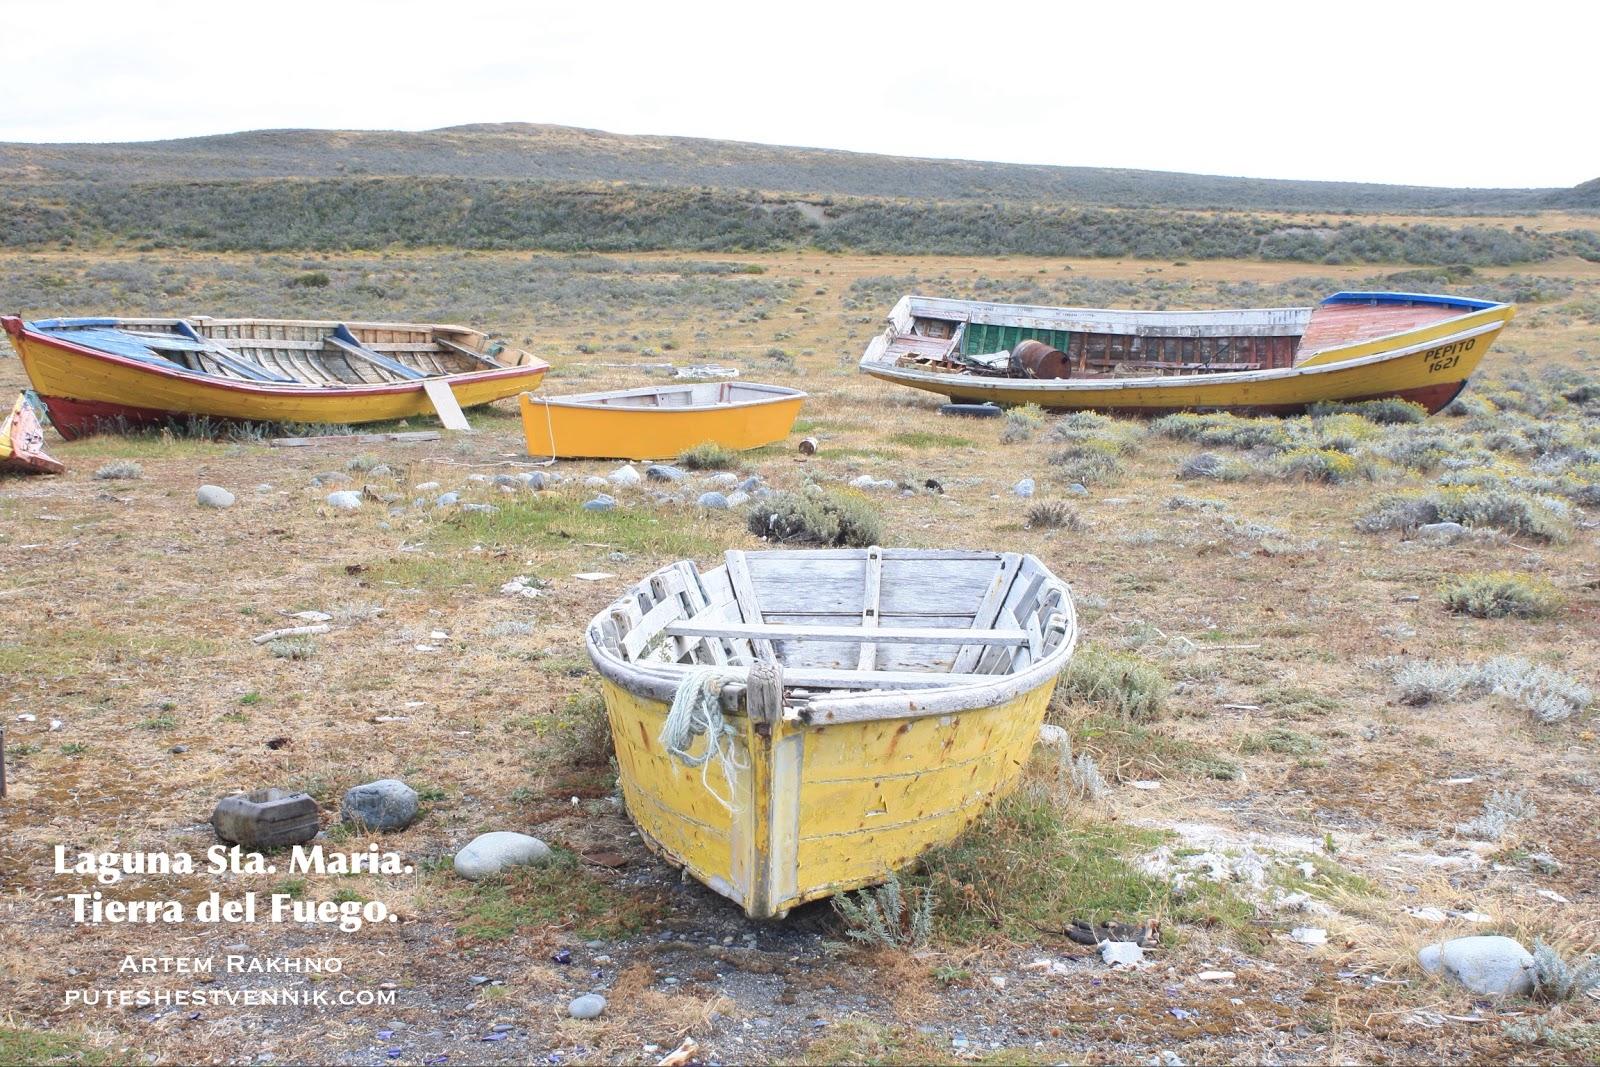 Четыре лодки на суше